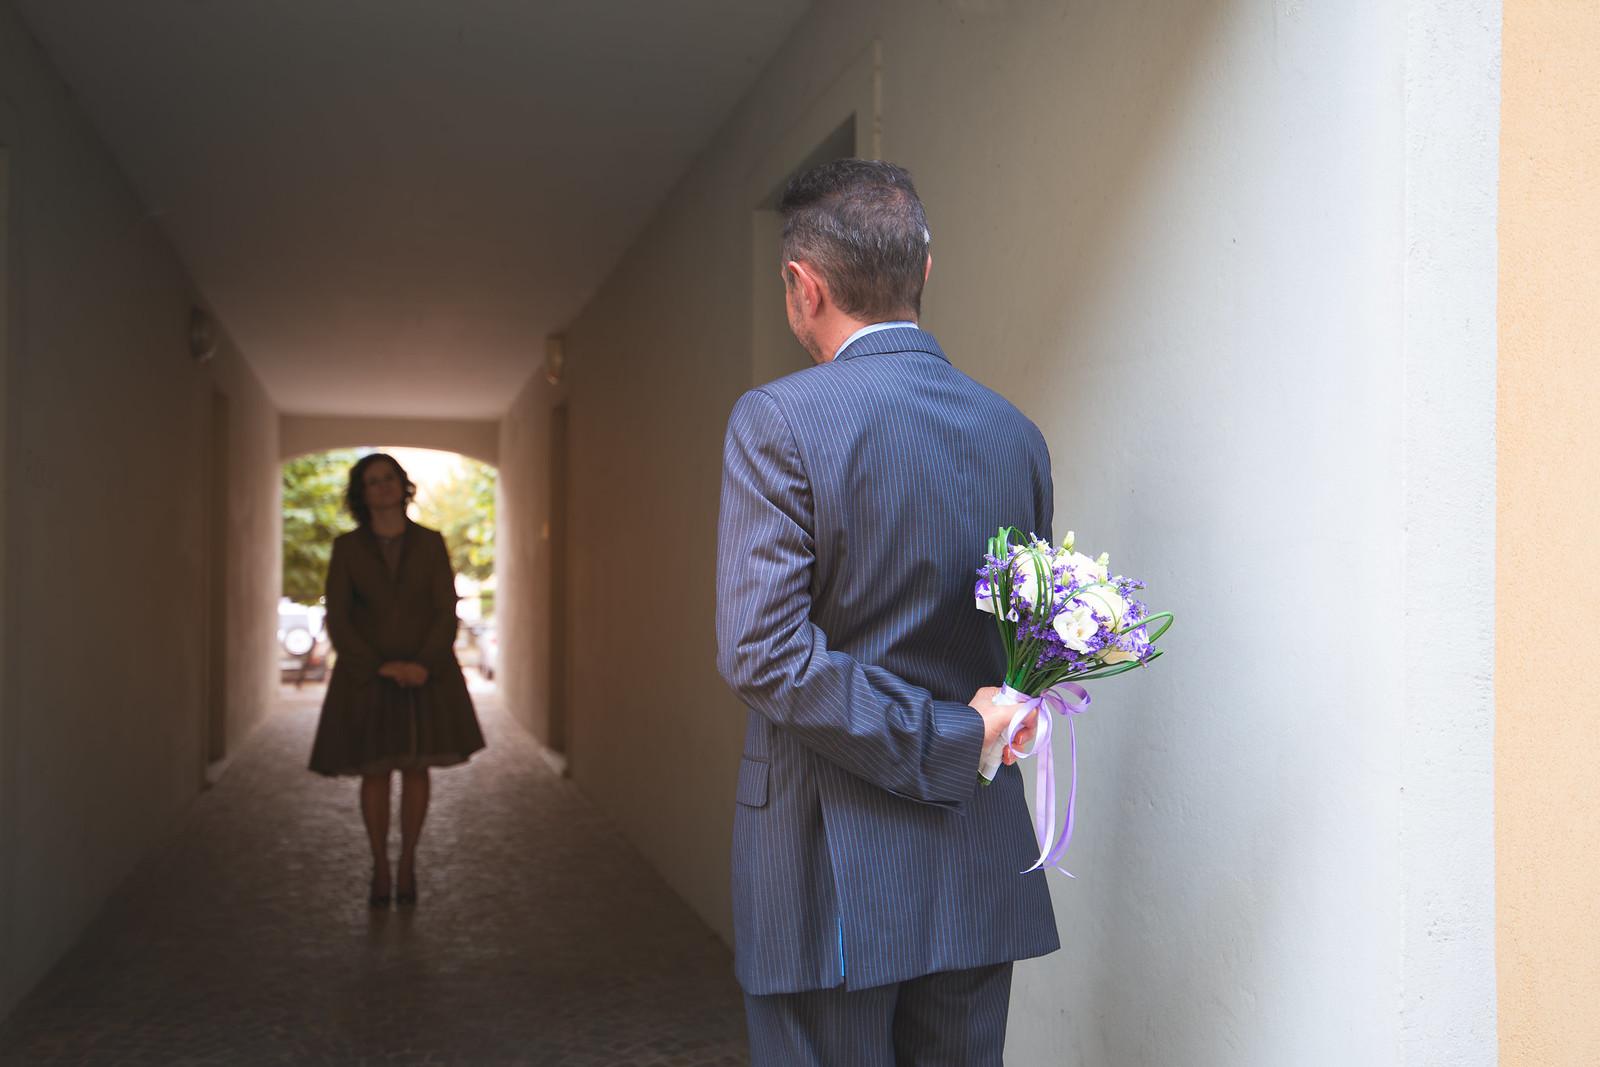 epspictures, Endless Purple Skies Pictures, fotografie, nunta, eveniment, sedinta foto, fine art photography